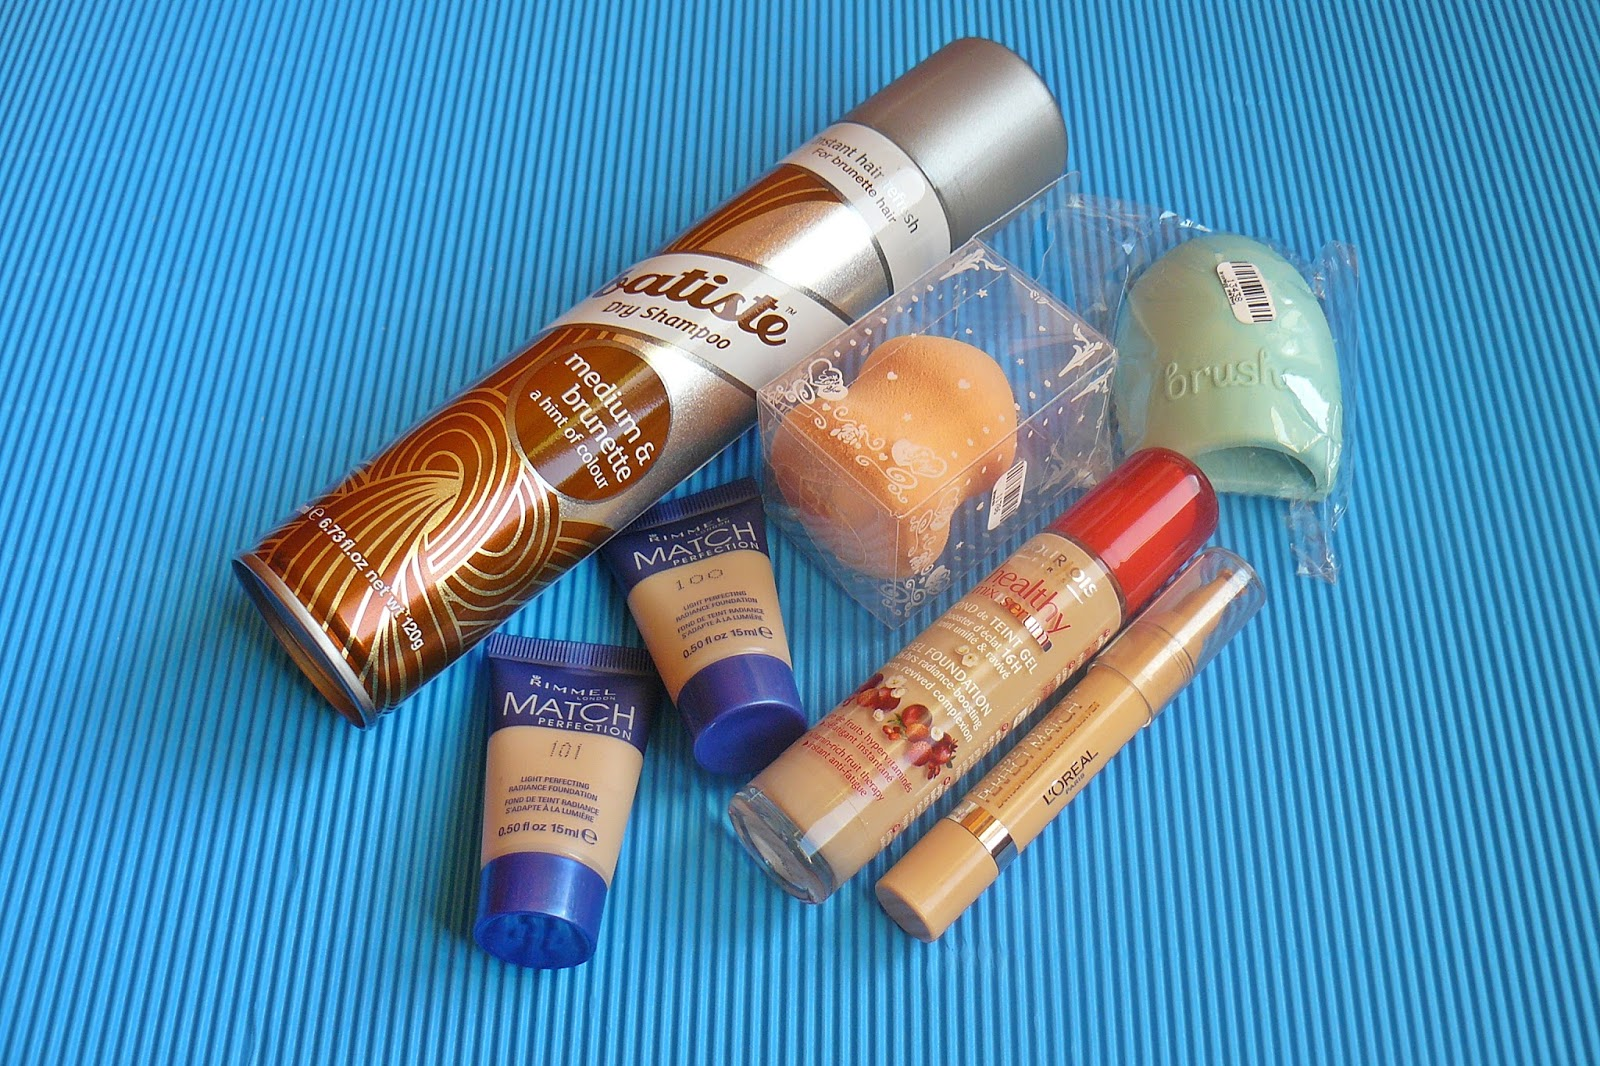 kosmetyki makeup